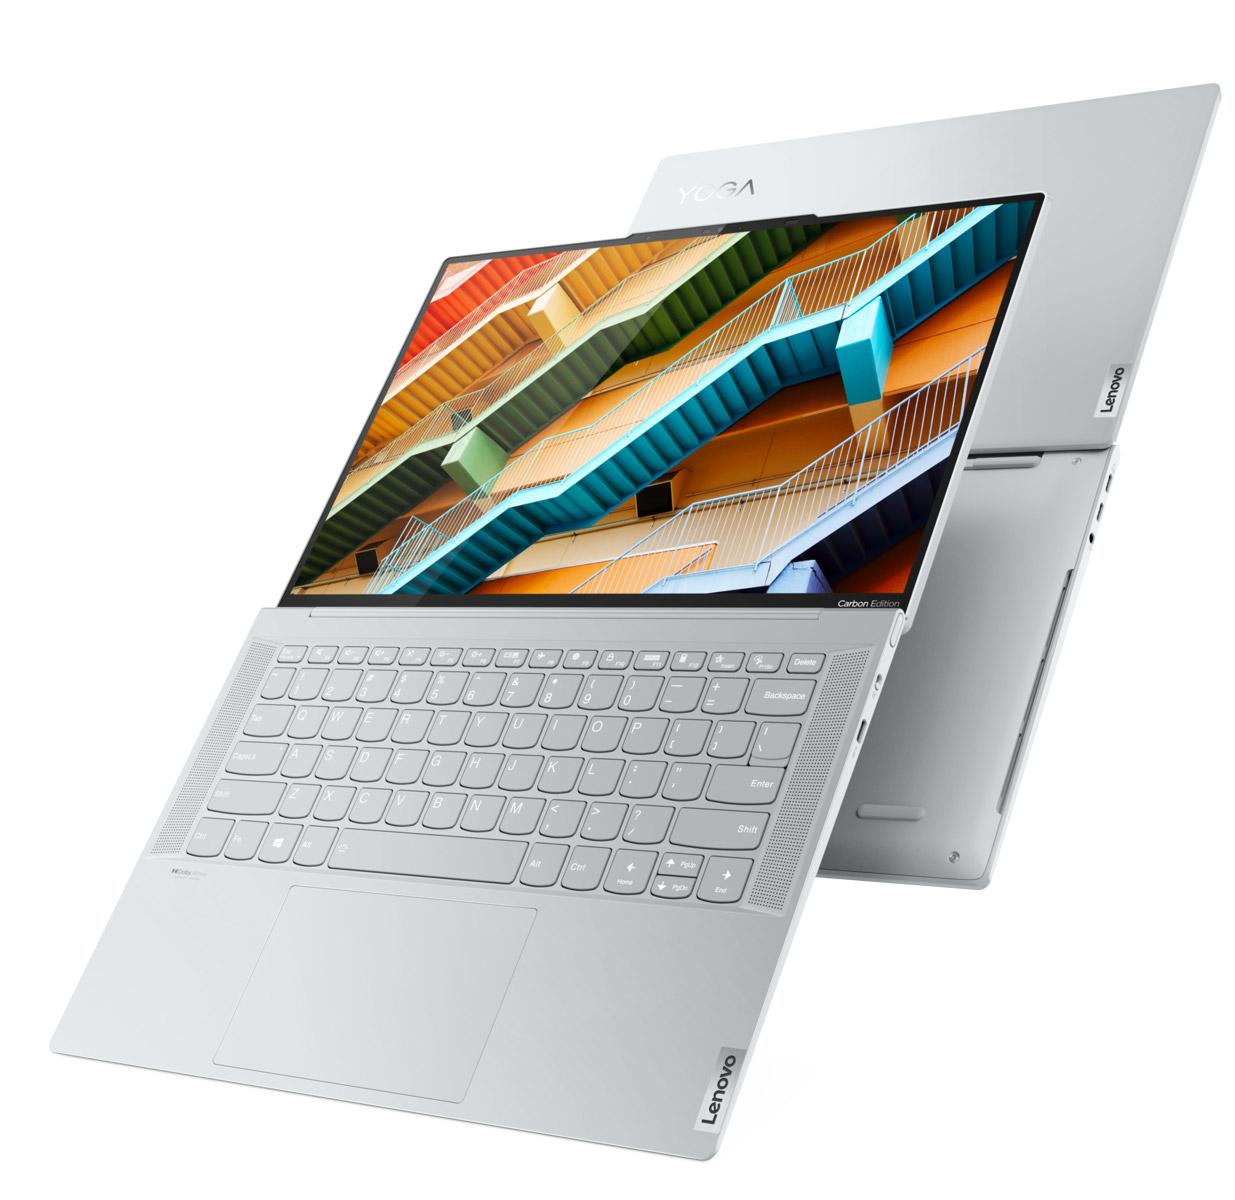 Enlightening Laptop: Lenovo Yoga Slim 7 Carbon at werd.com